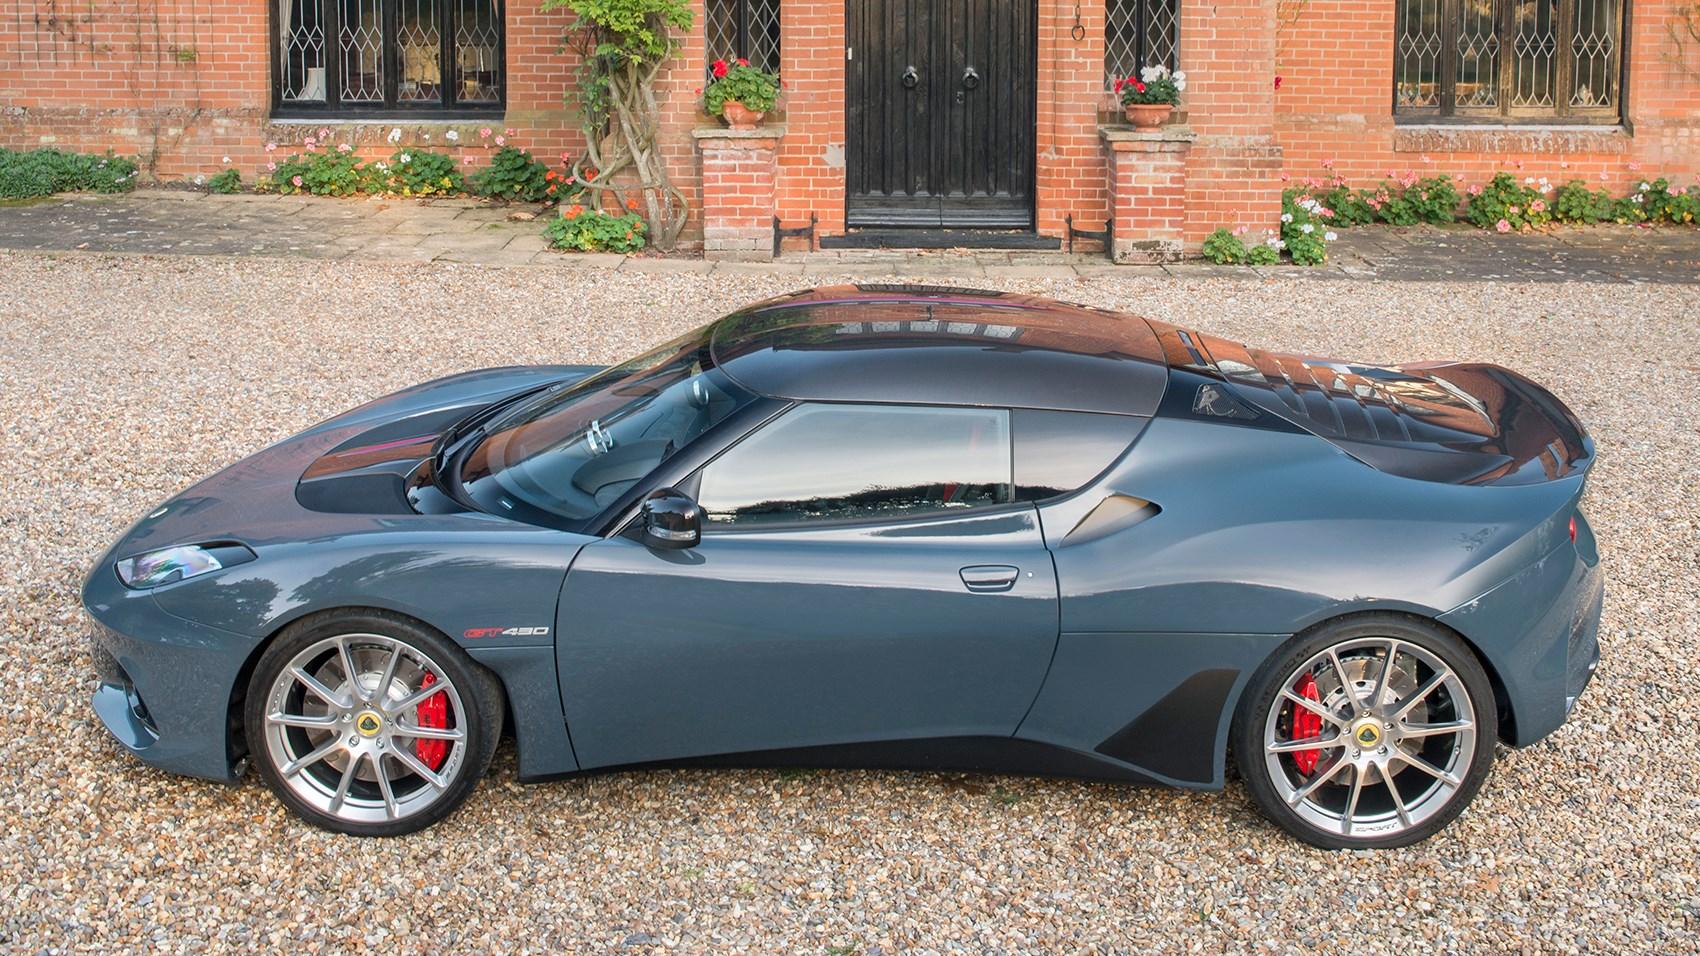 Ben arrivata Evora GT430 Sport Lotus-evora-gt430-15